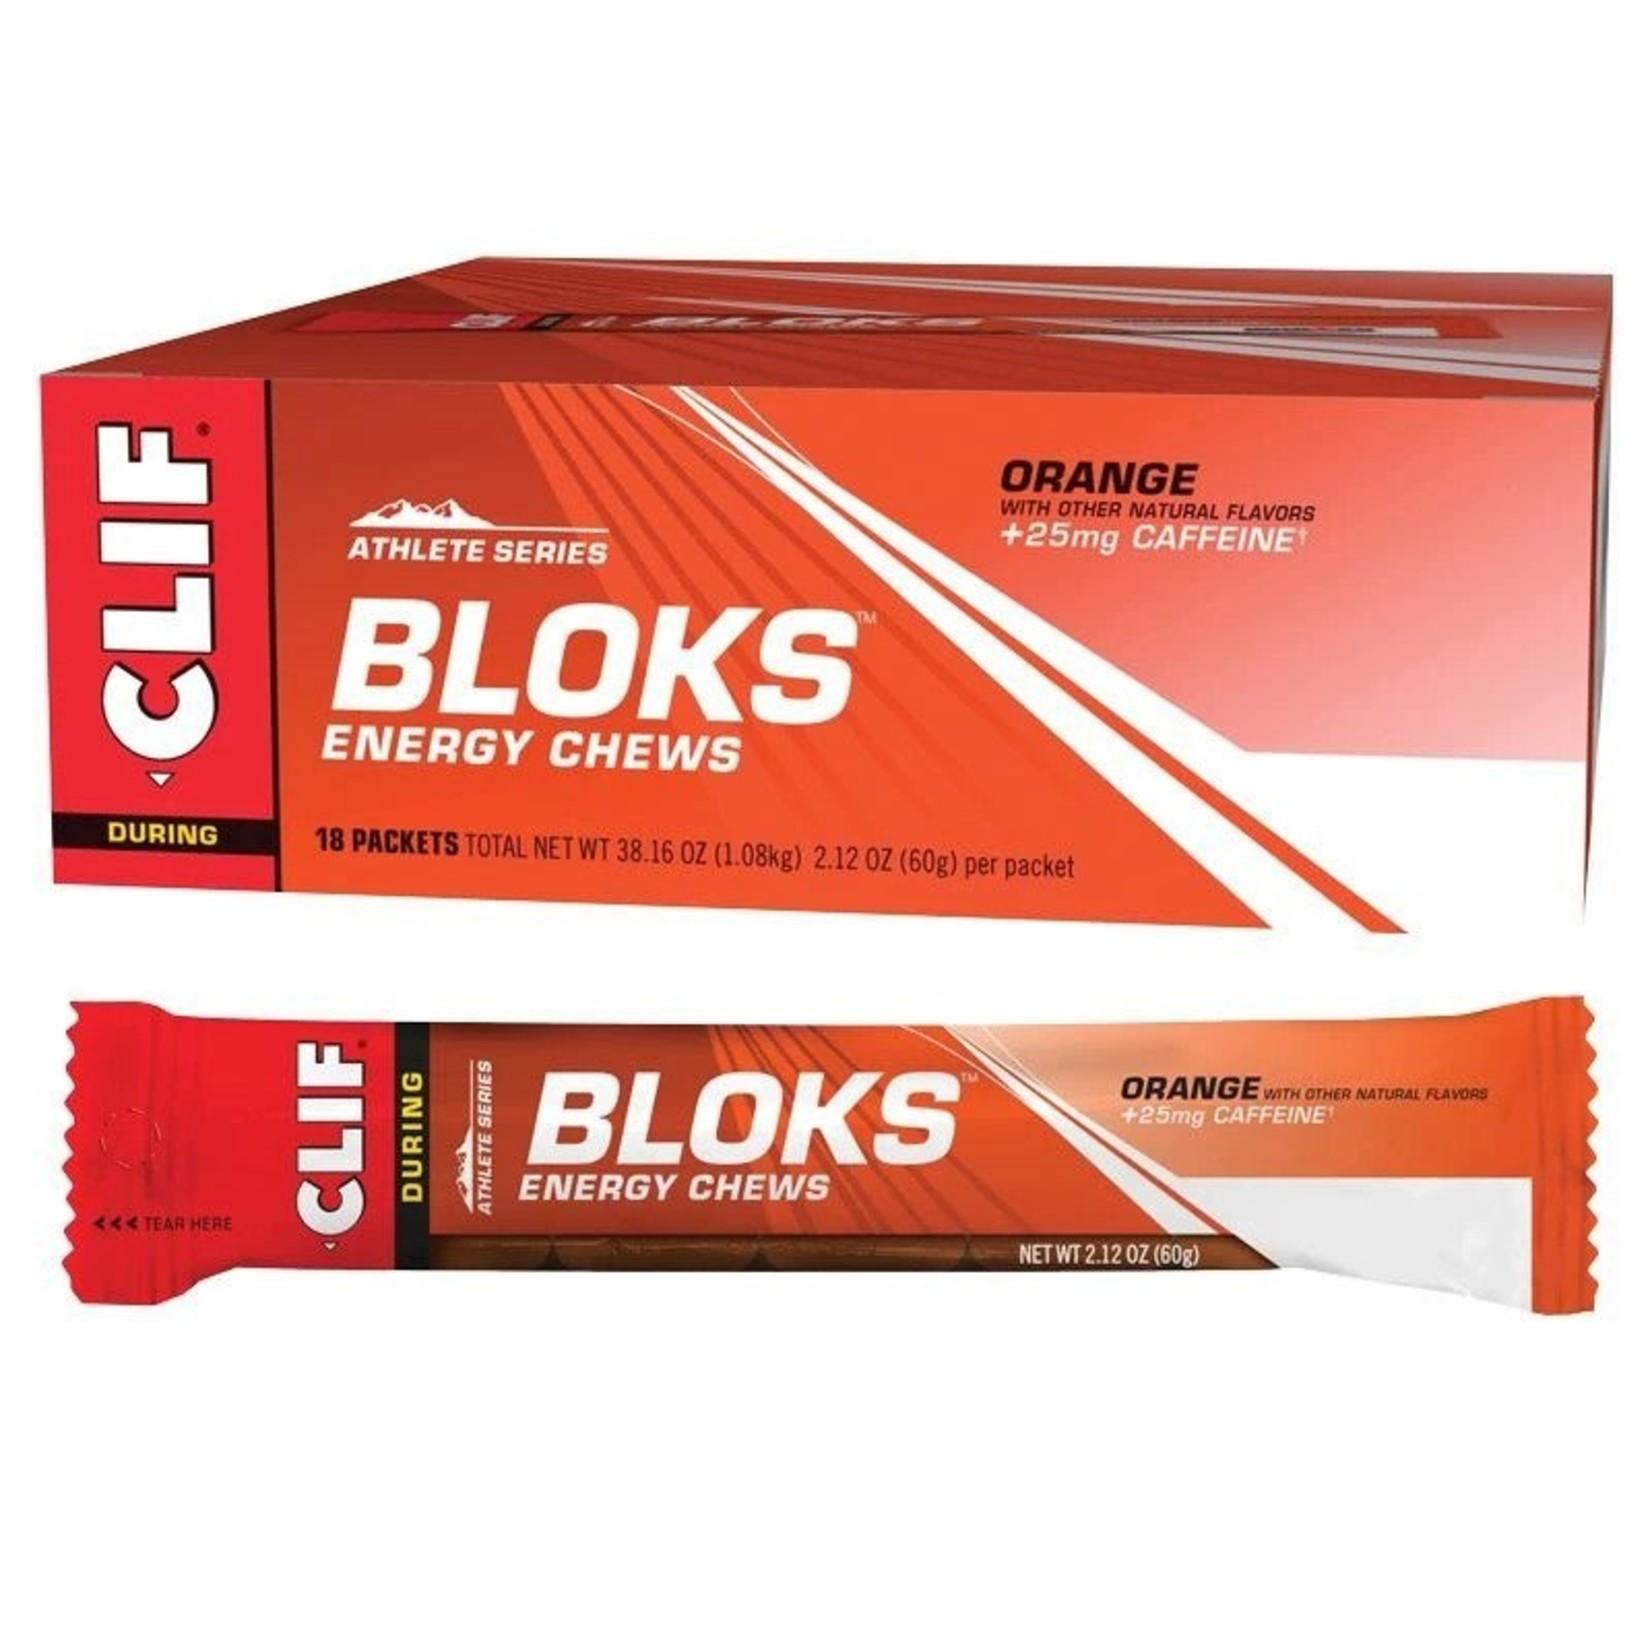 Clif Clif, Bloks Energy Chews Orange